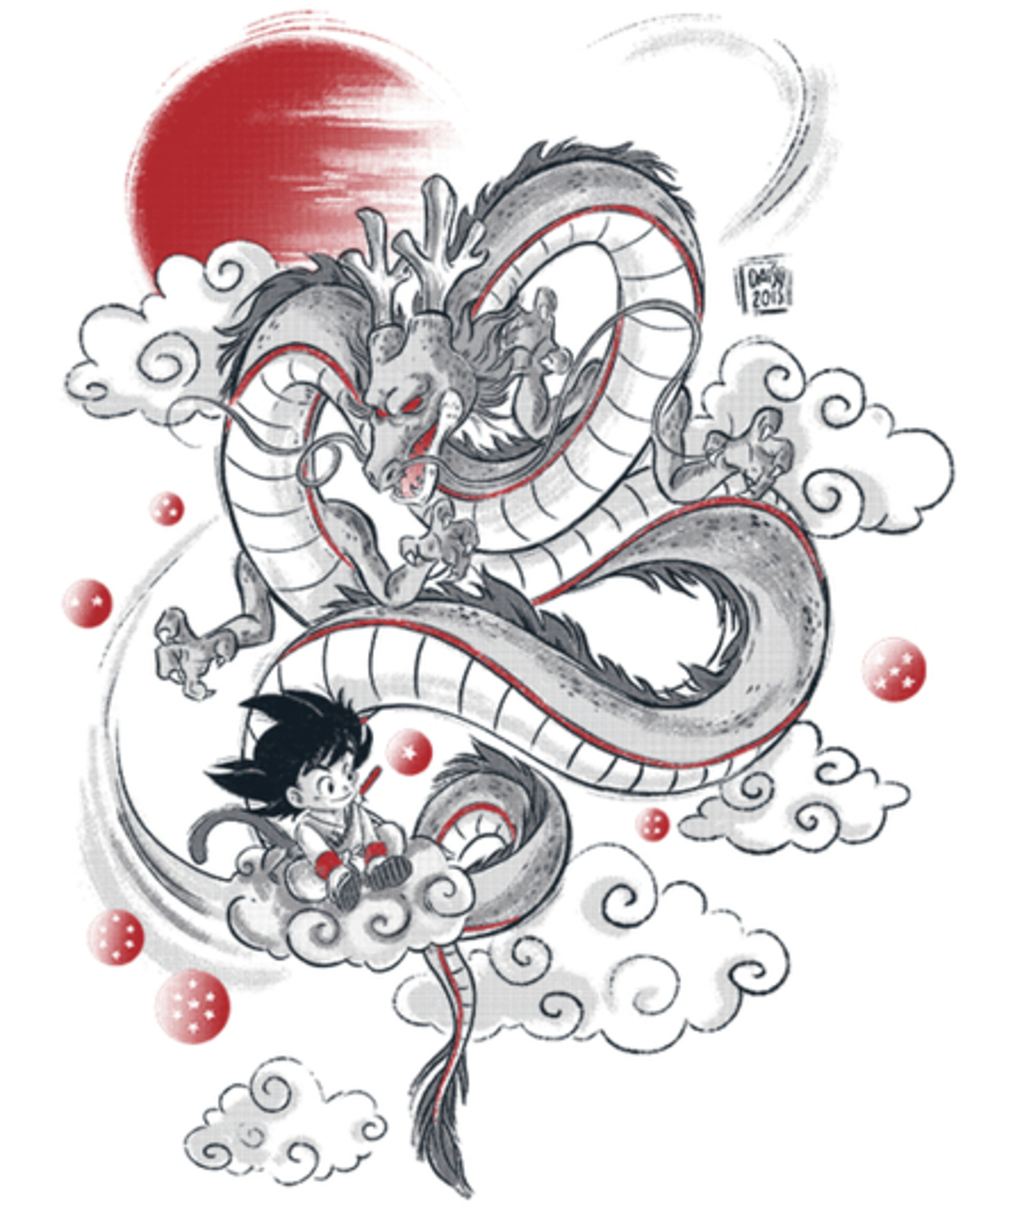 Qwertee: My Dragon friend